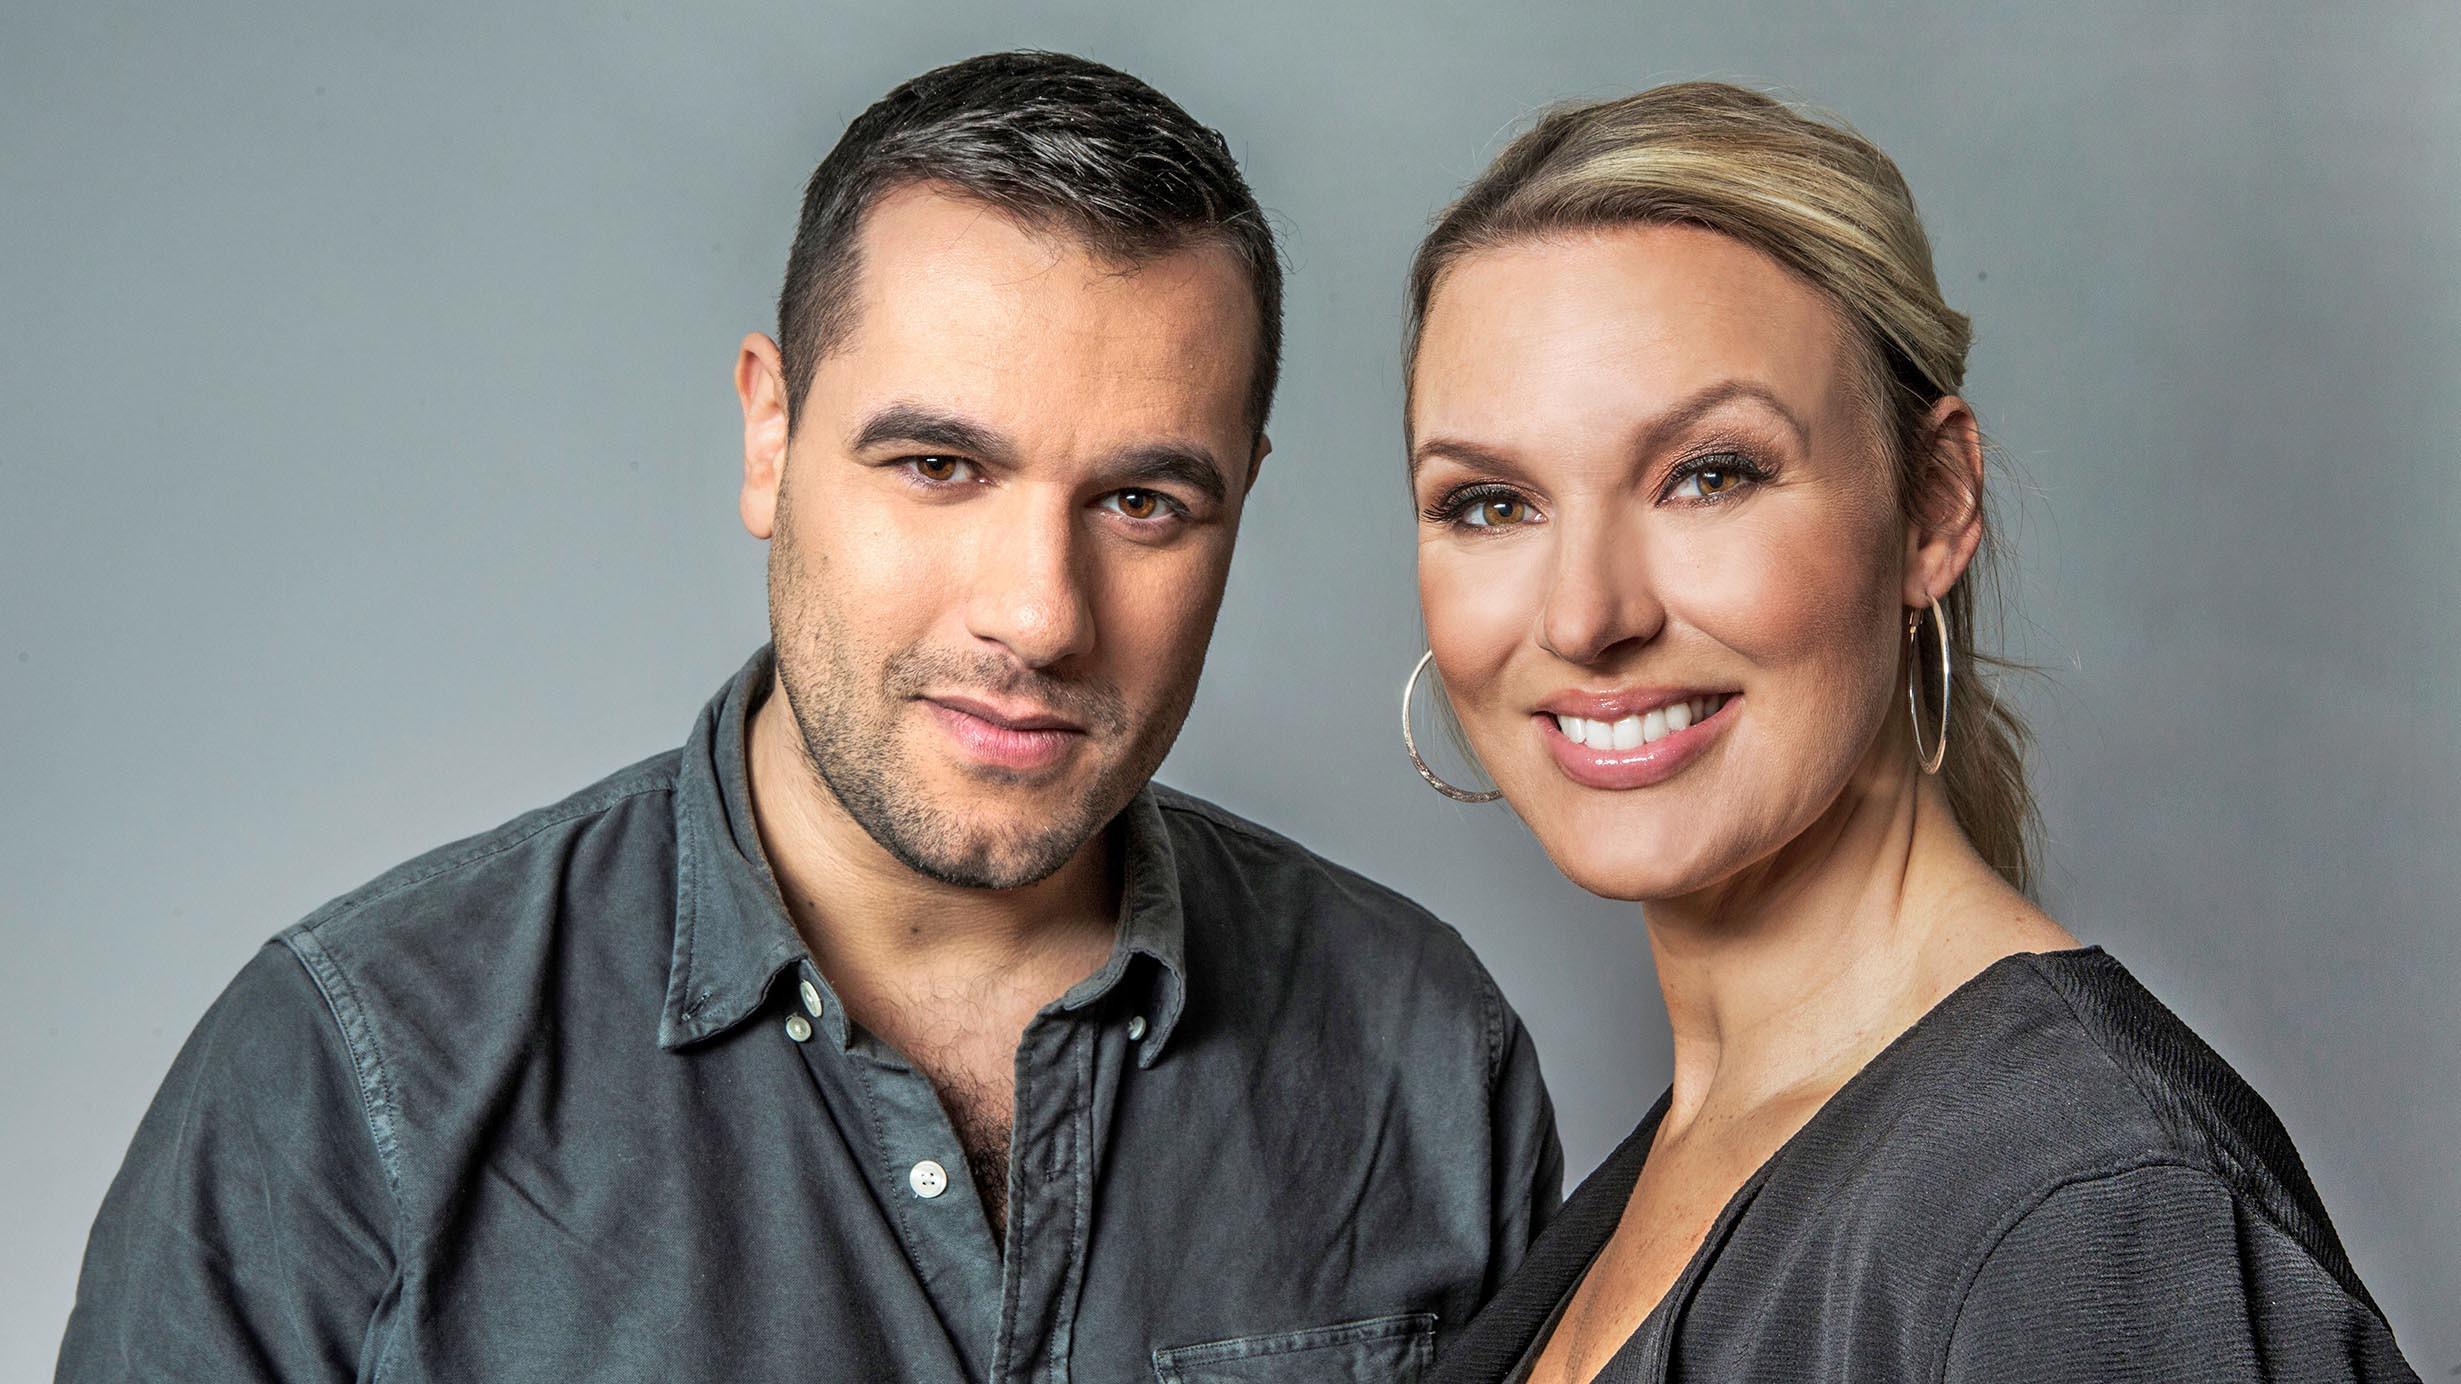 Sanna Nielsen och Edward af Sillén kommenterar Eurovision i Lissabon